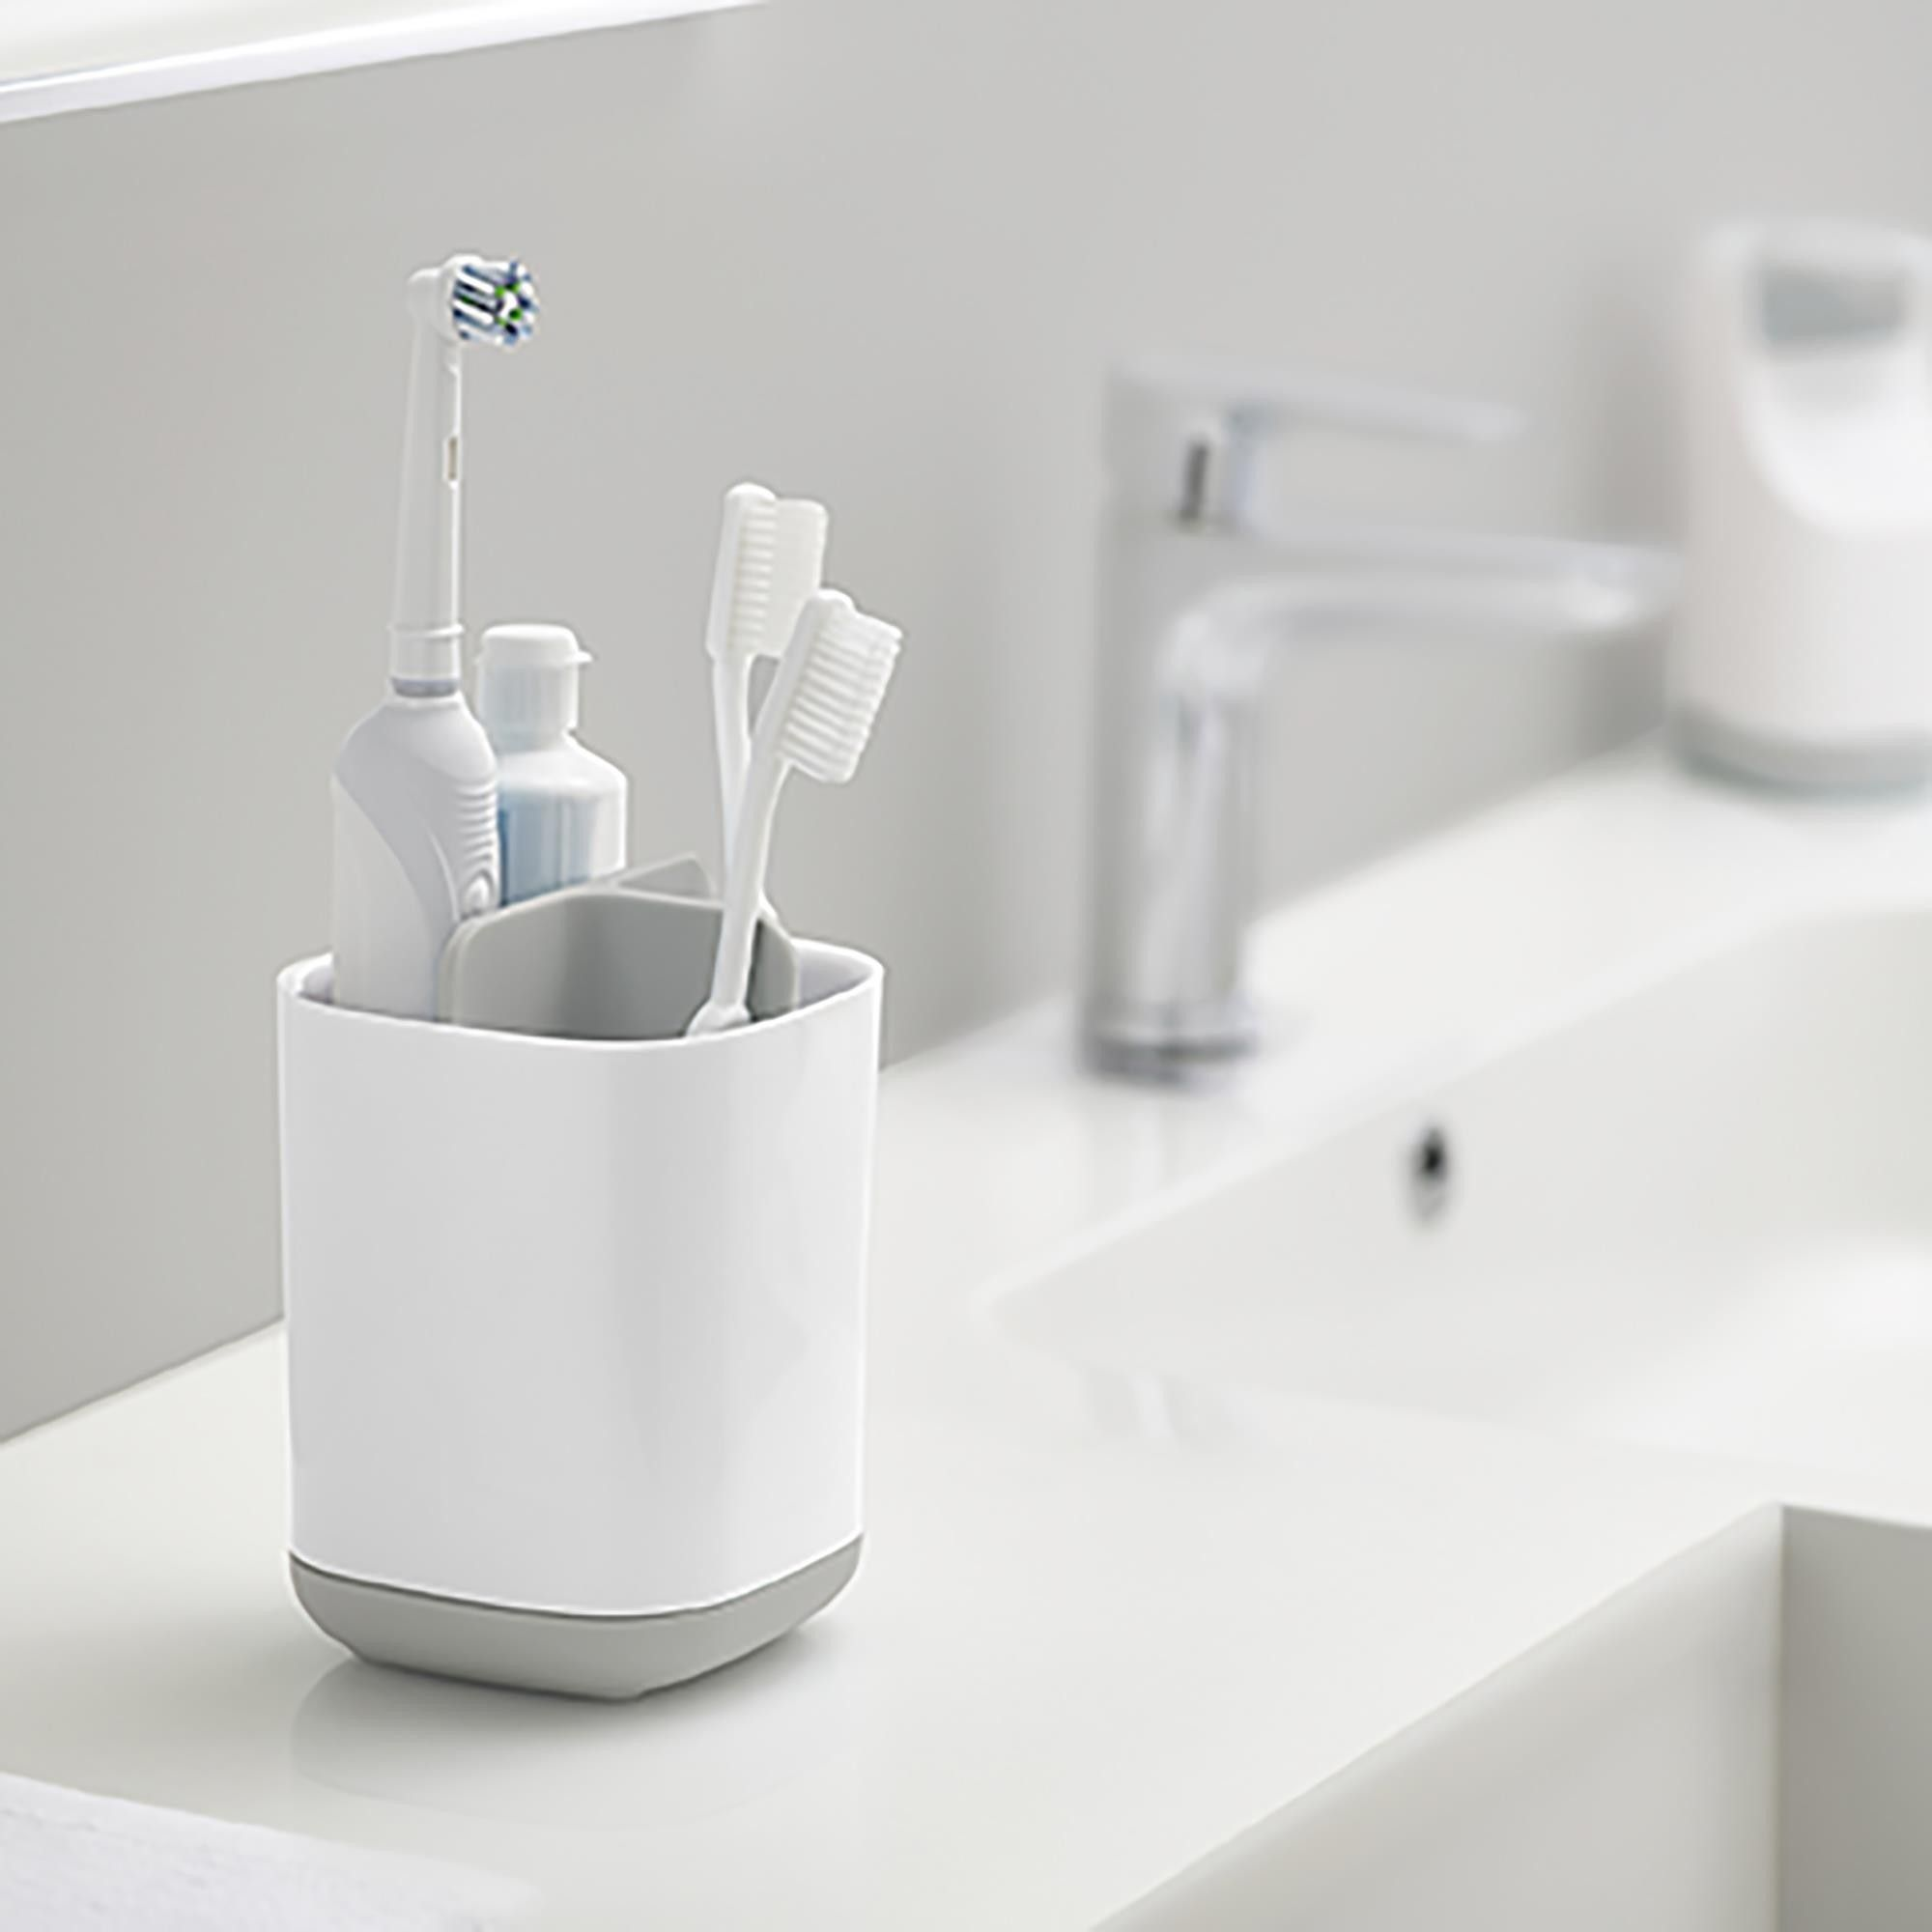 Joseph Joseph Smart Bath Toothbrush Holder Caddy White Grey In 2020 Brushing Teeth Toothbrush And Toothpaste Holder Toothbrush Holder